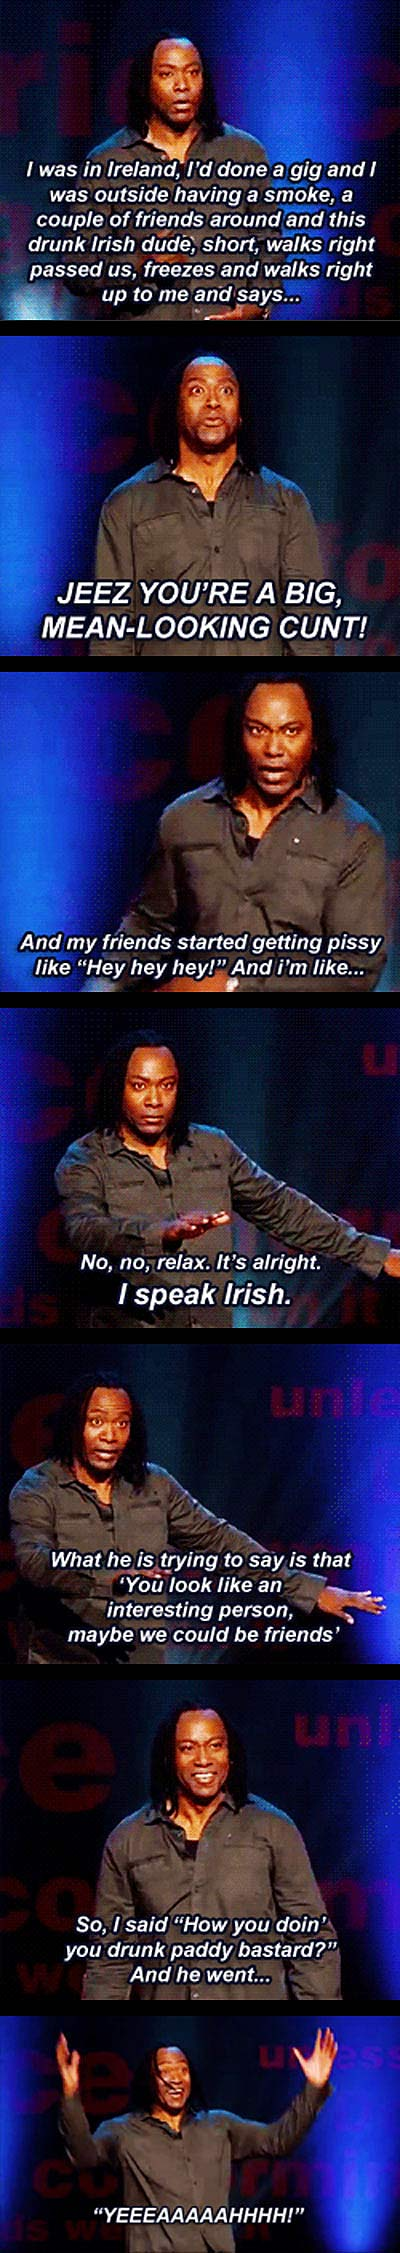 funny-speak-Irish-drunk